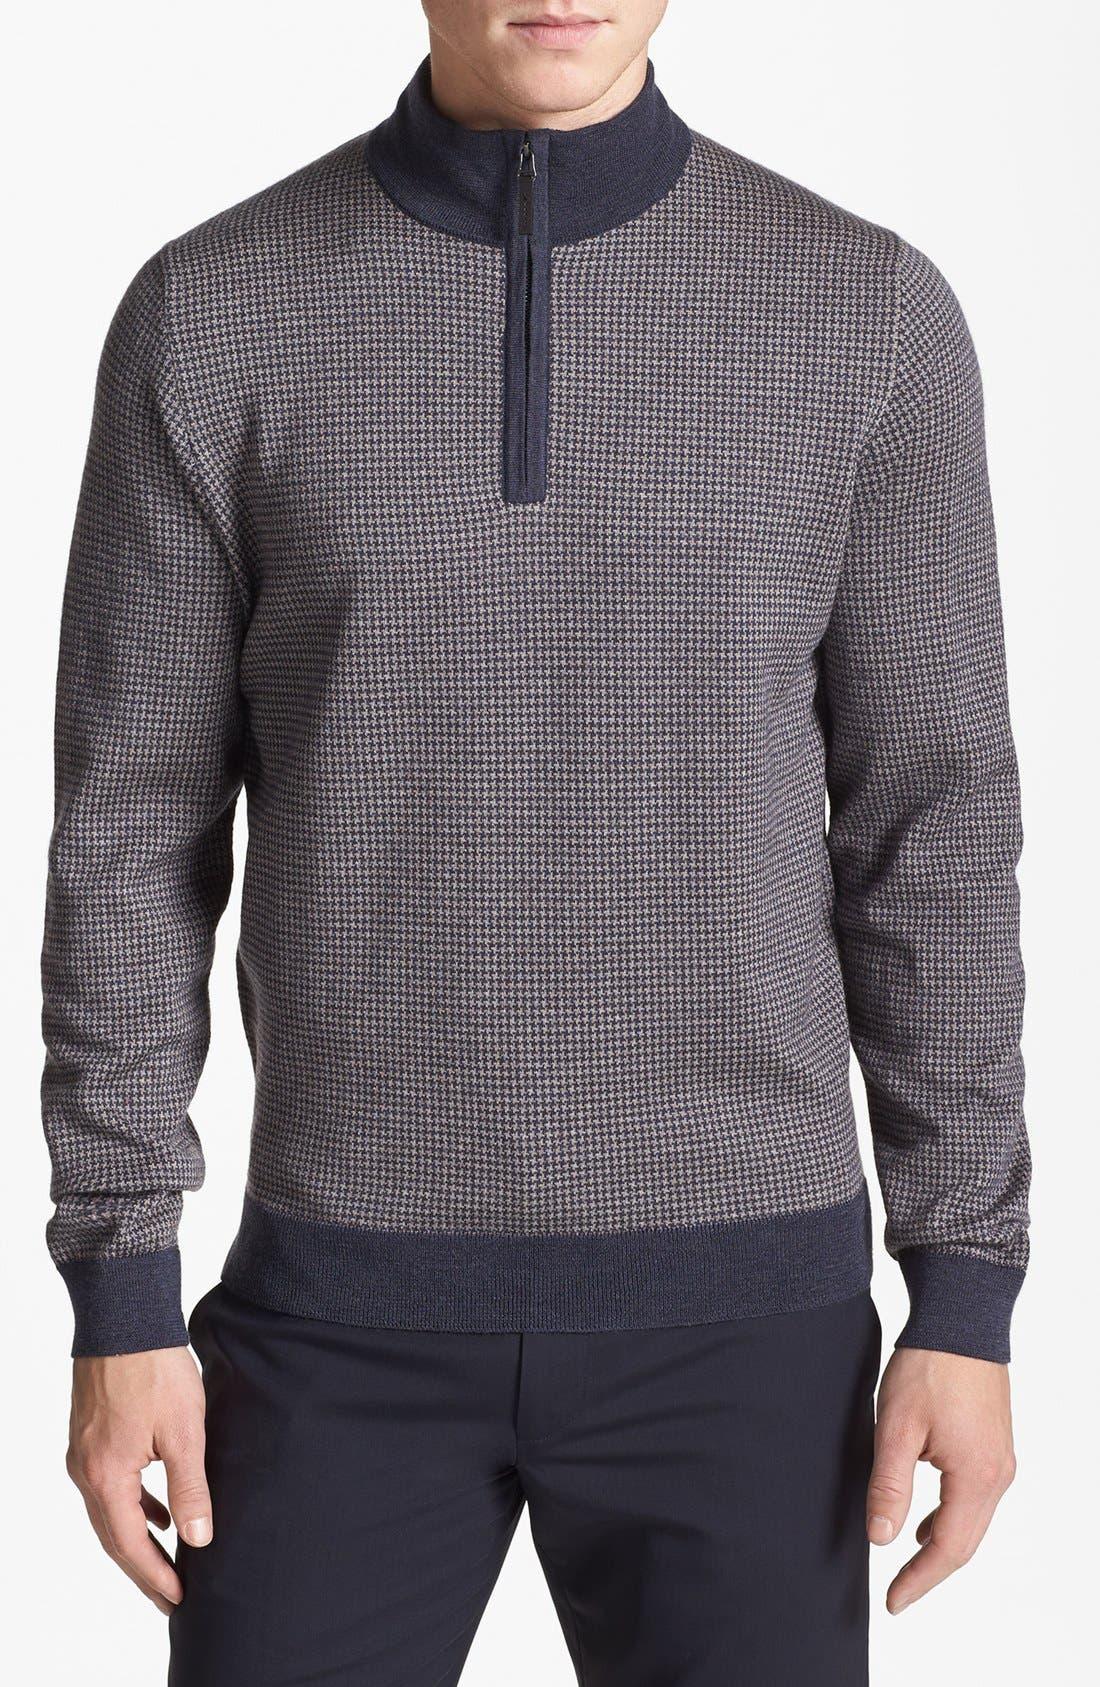 Main Image - John W. Nordstrom® Merino Wool Quarter Zip Pullover